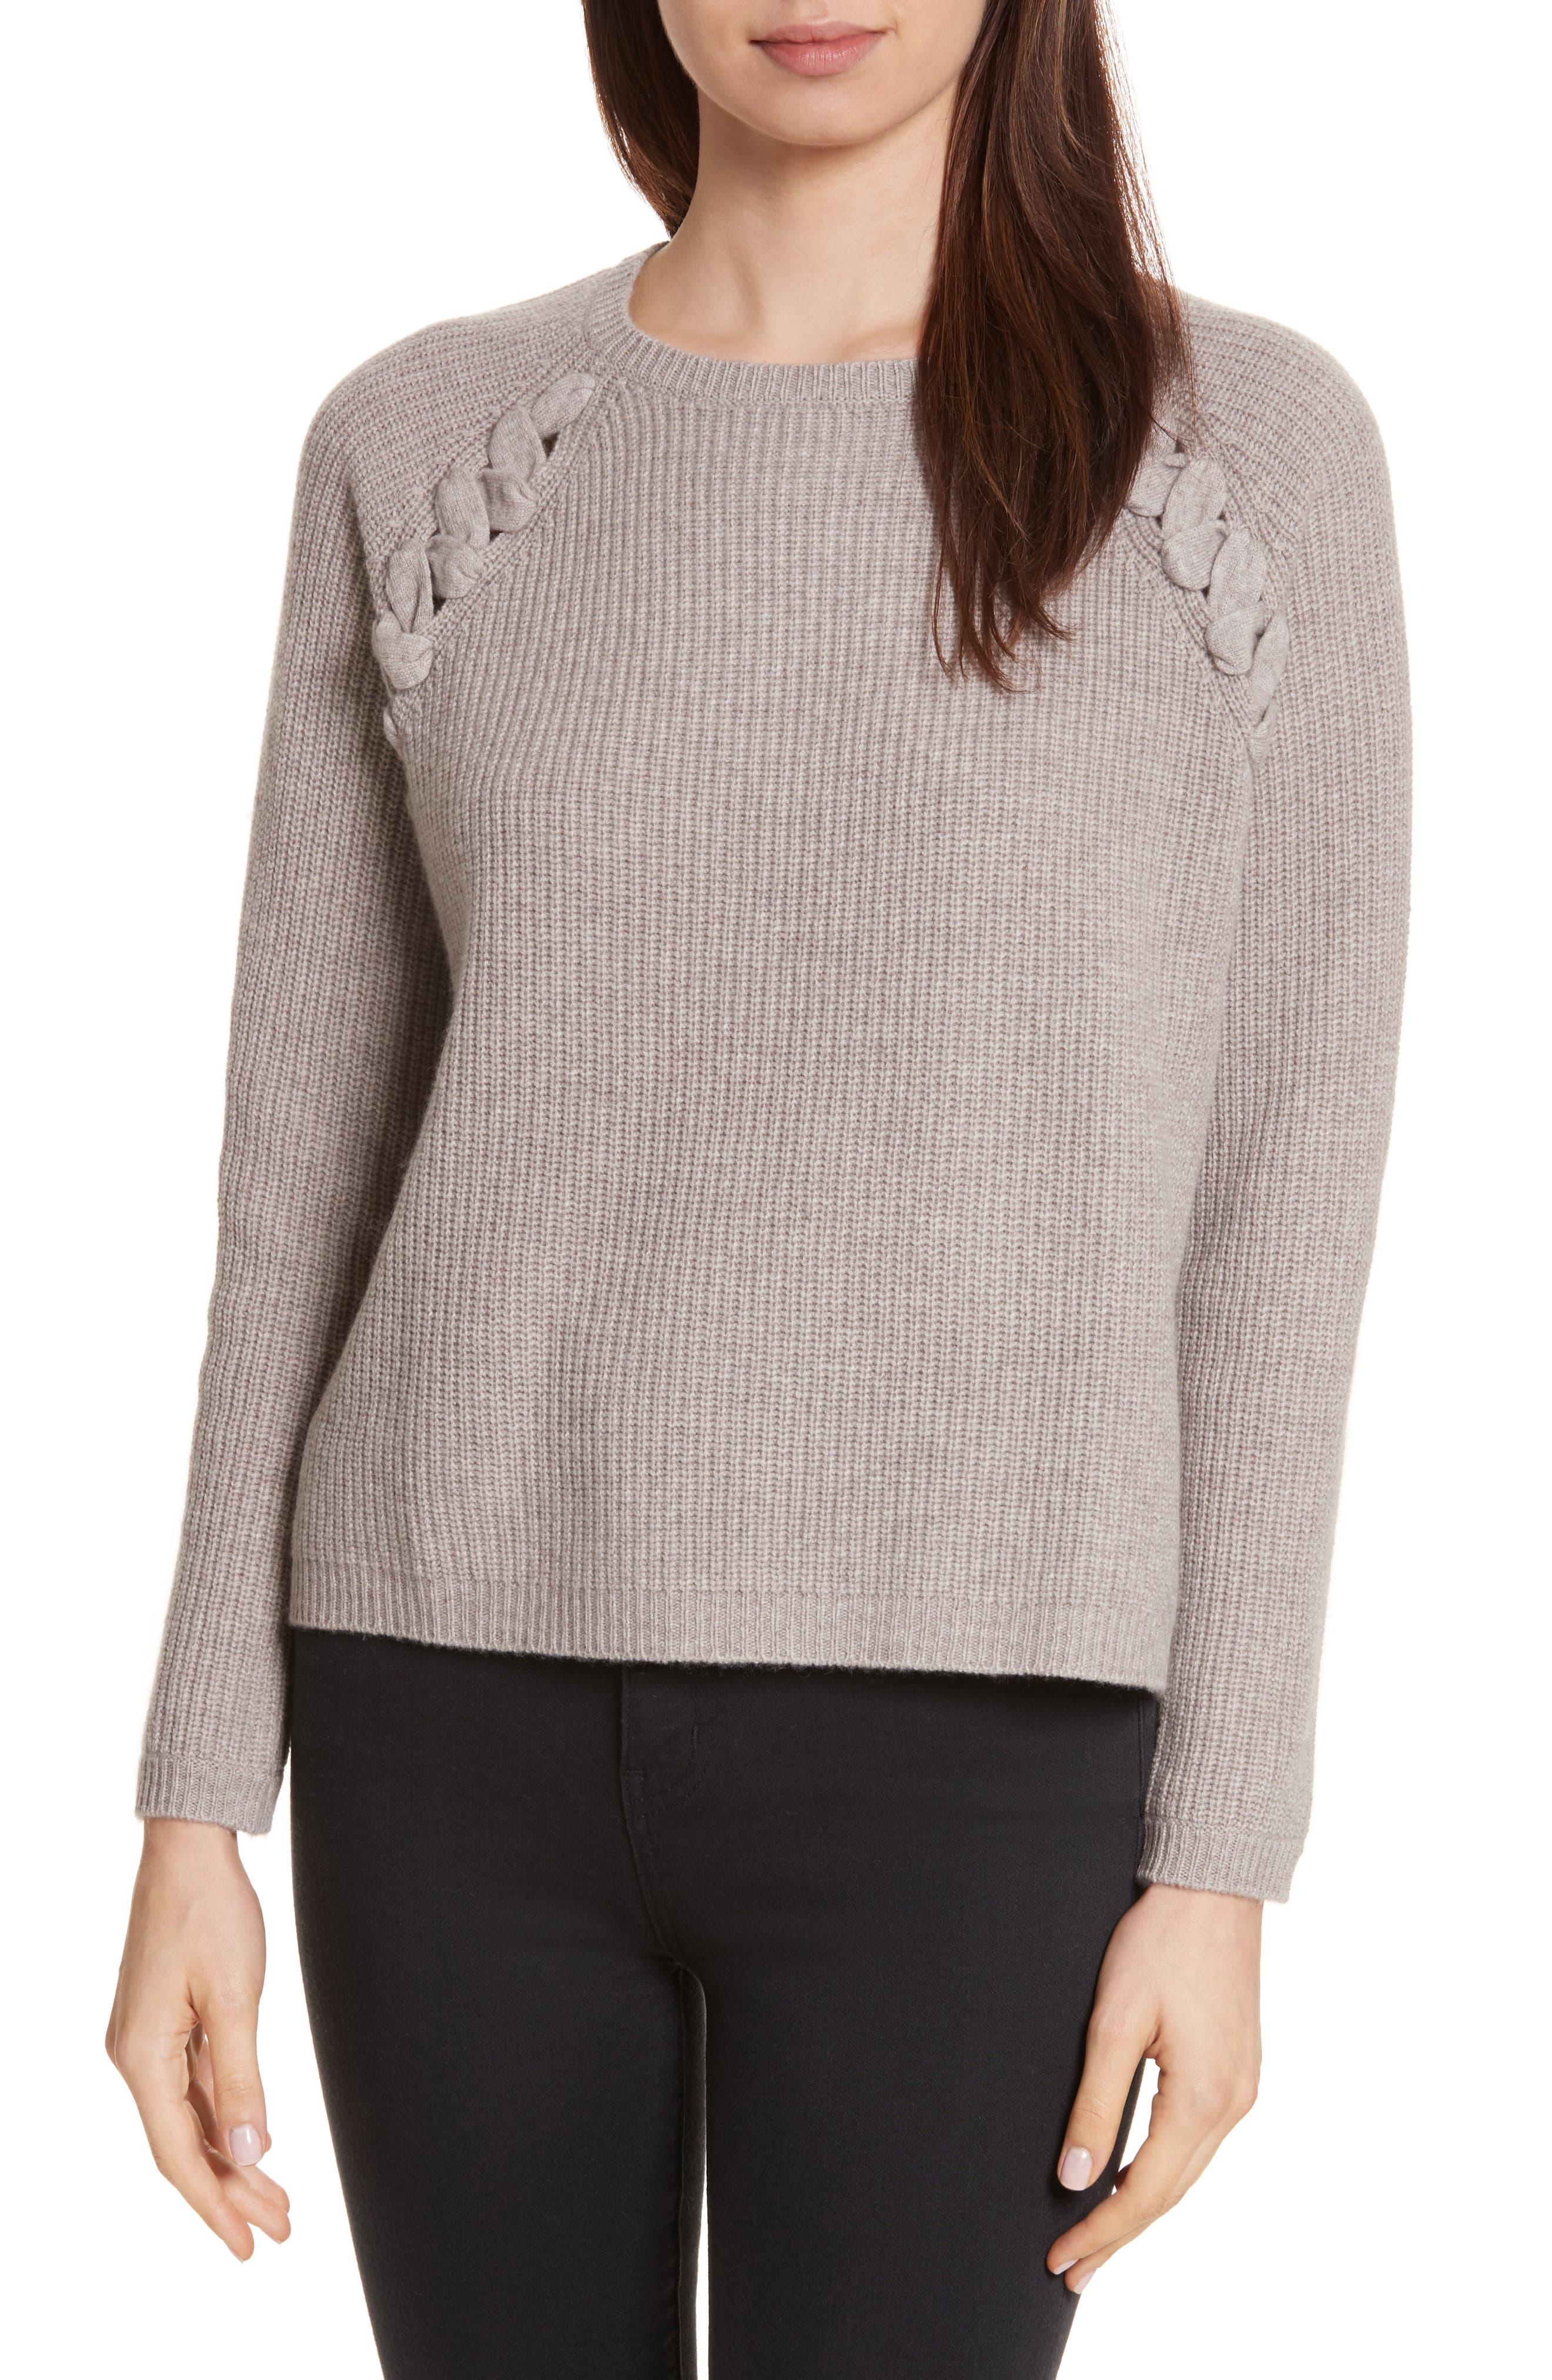 Main Image - Allude Merino Wool & Cashmere Braid Detail Sweater